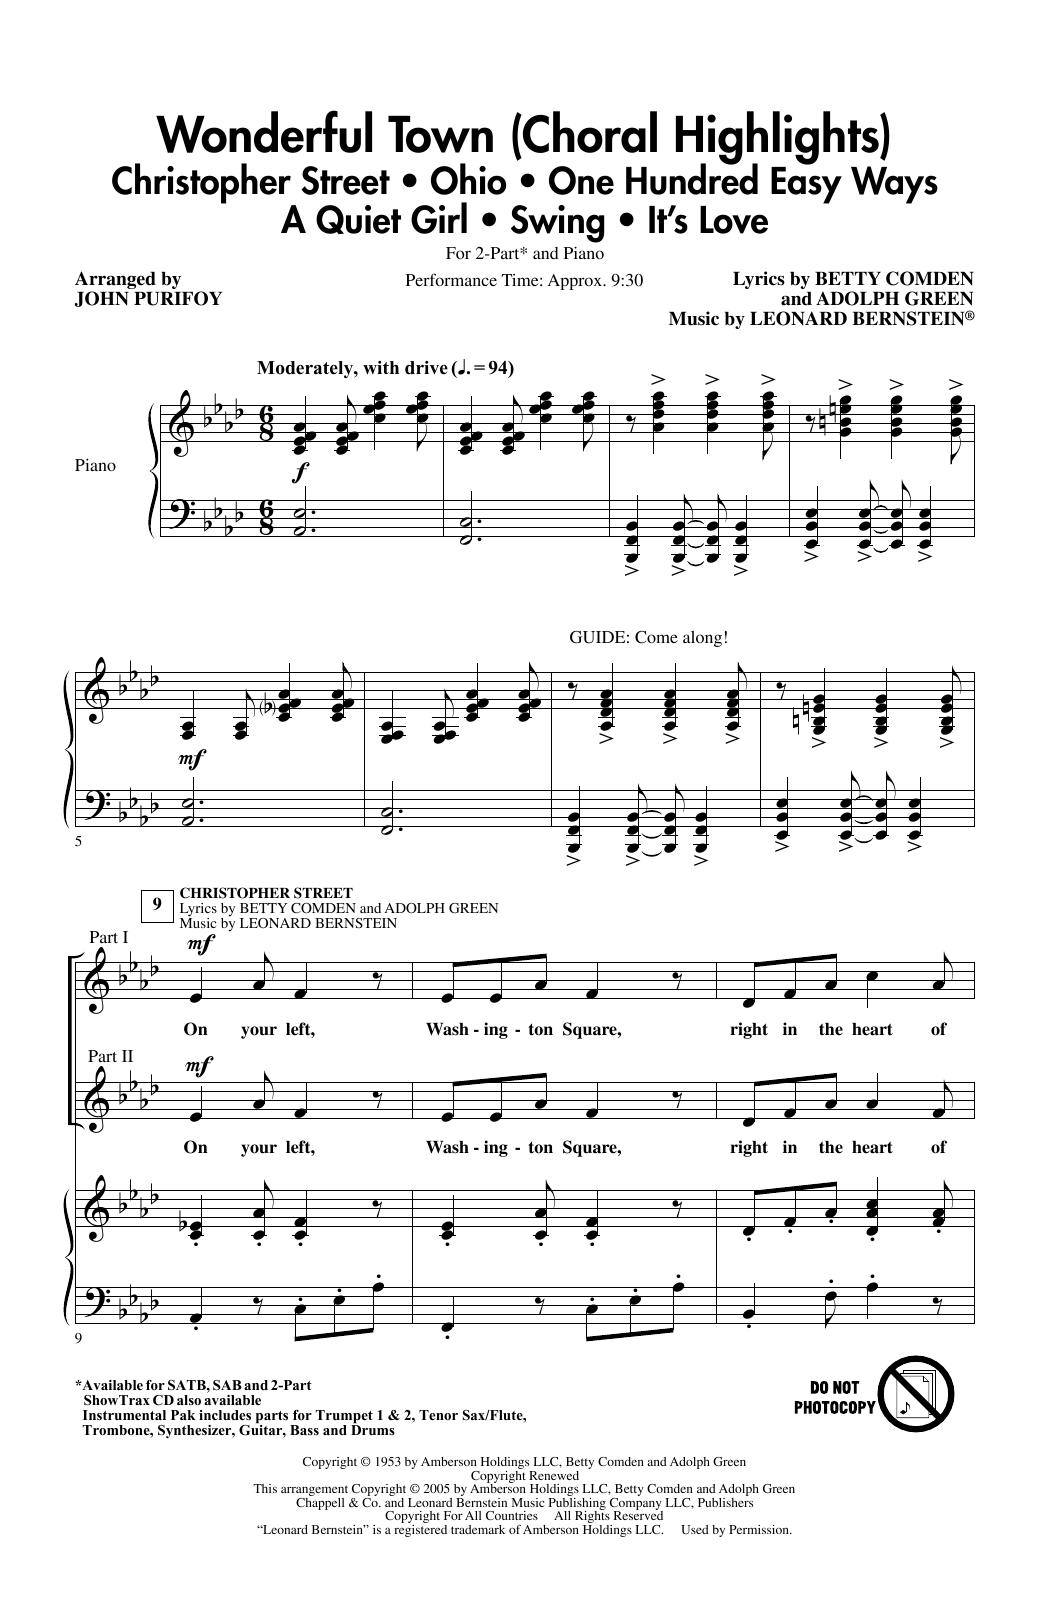 Wonderful Town (Choral Highlights) (arr. John Purifoy) (2-Part Choir)